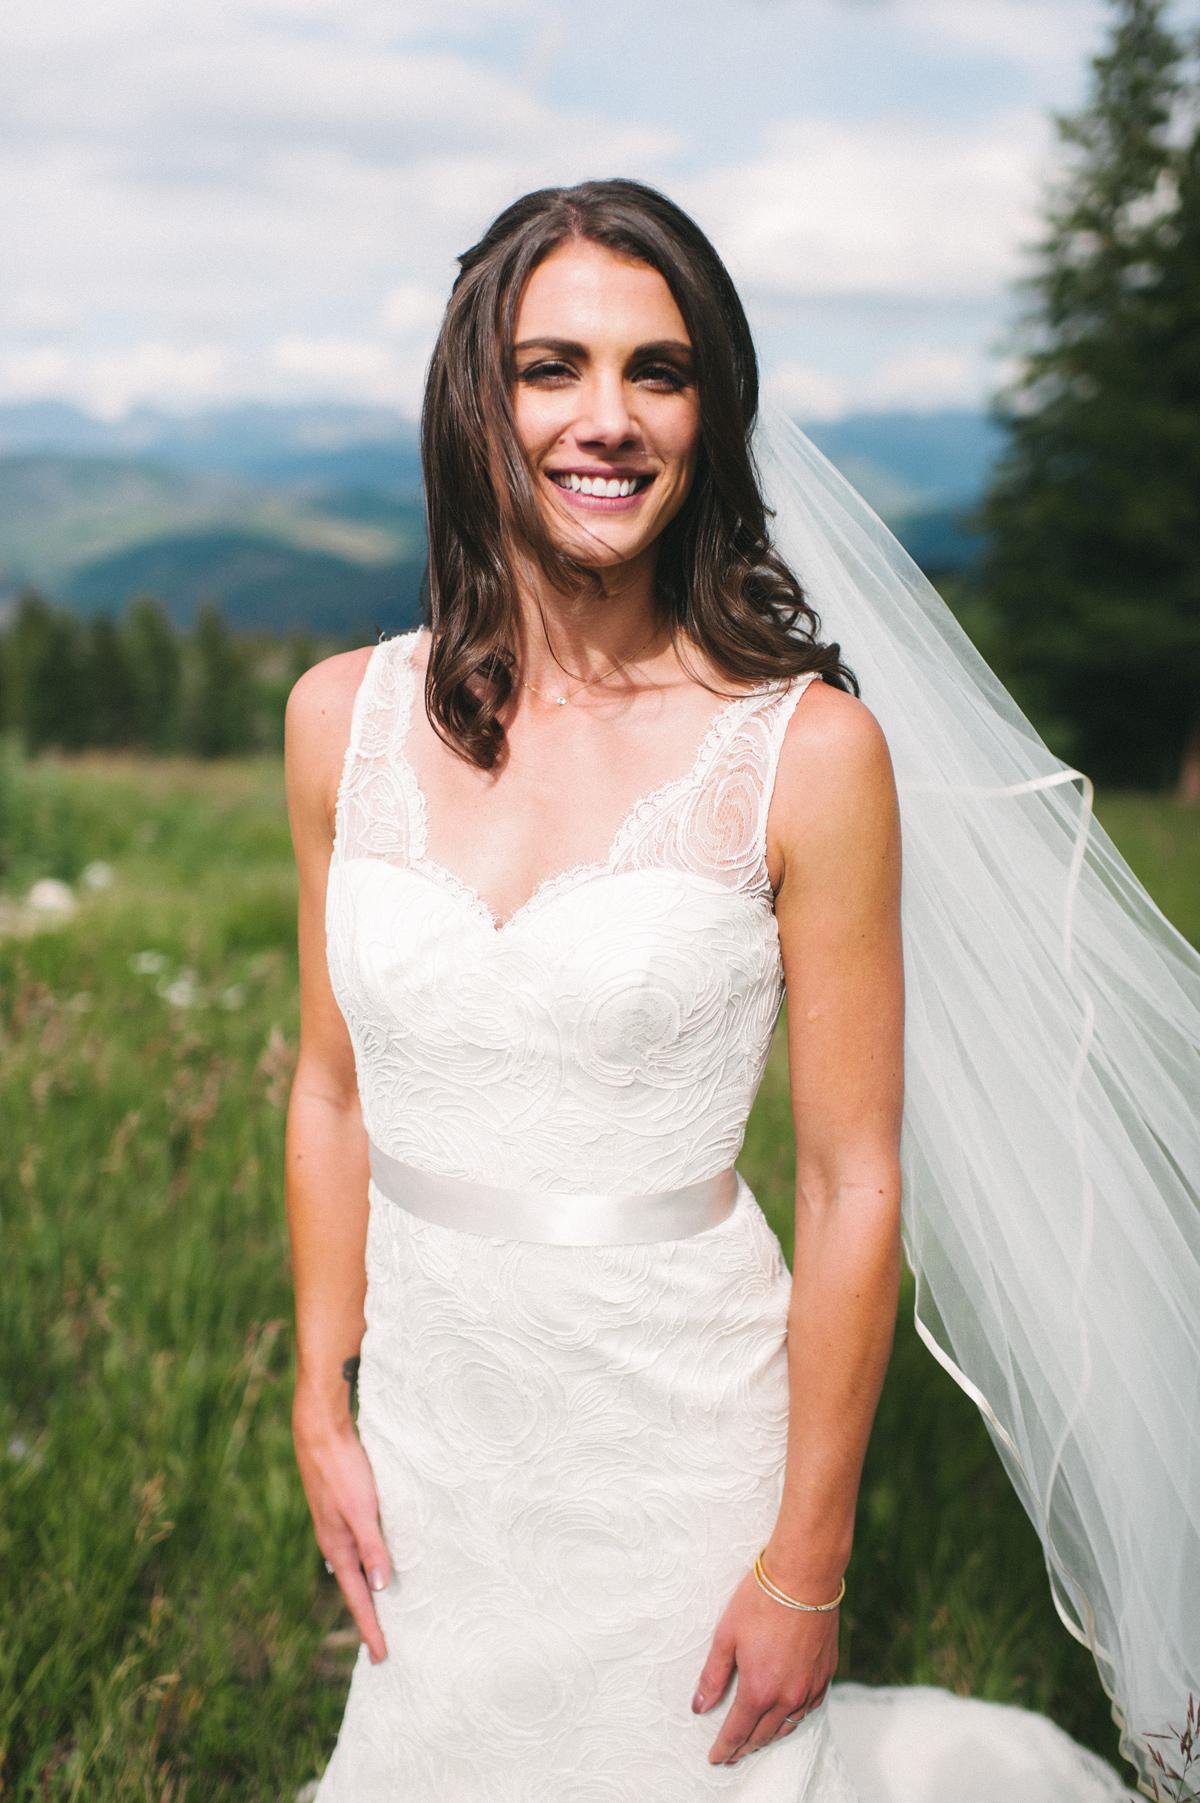 361-beaver-creek--bride--portrait--mountain-top.jpg